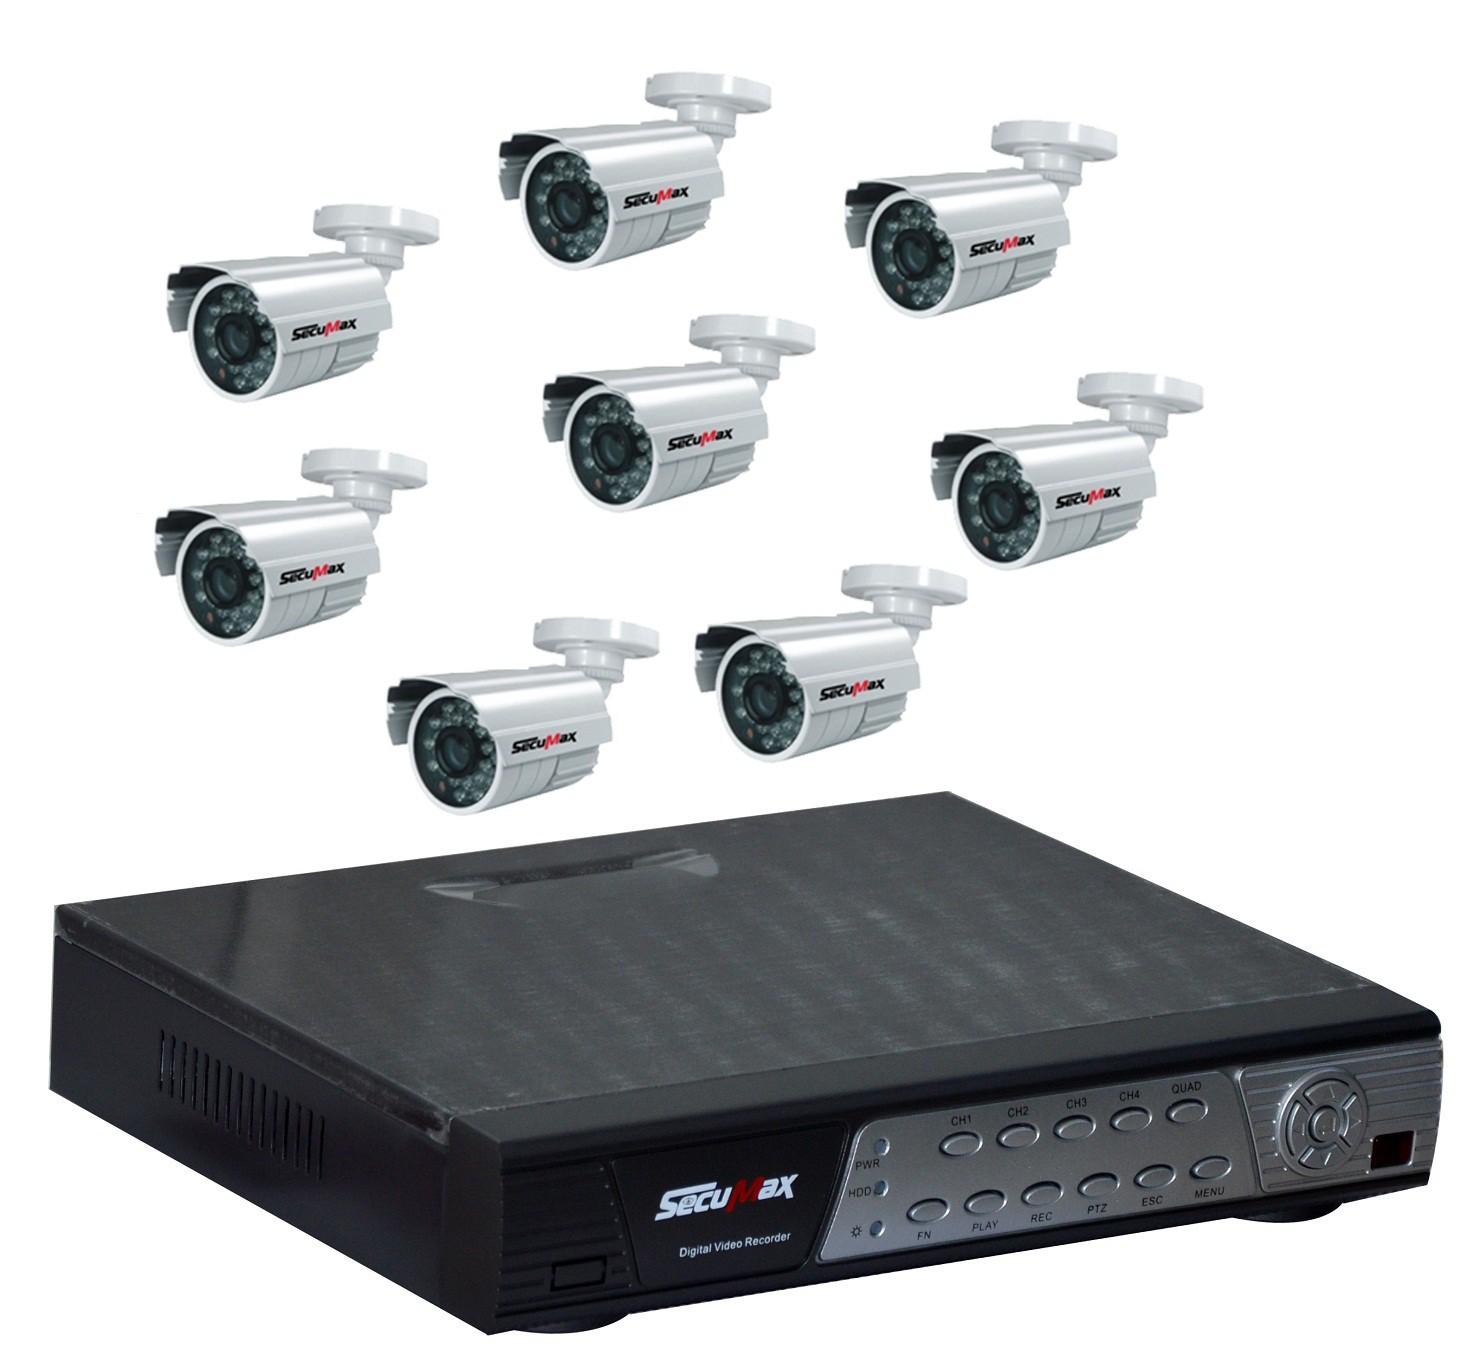 kit de surveillance cctv 8 canaux 8 cam ras secumax. Black Bedroom Furniture Sets. Home Design Ideas